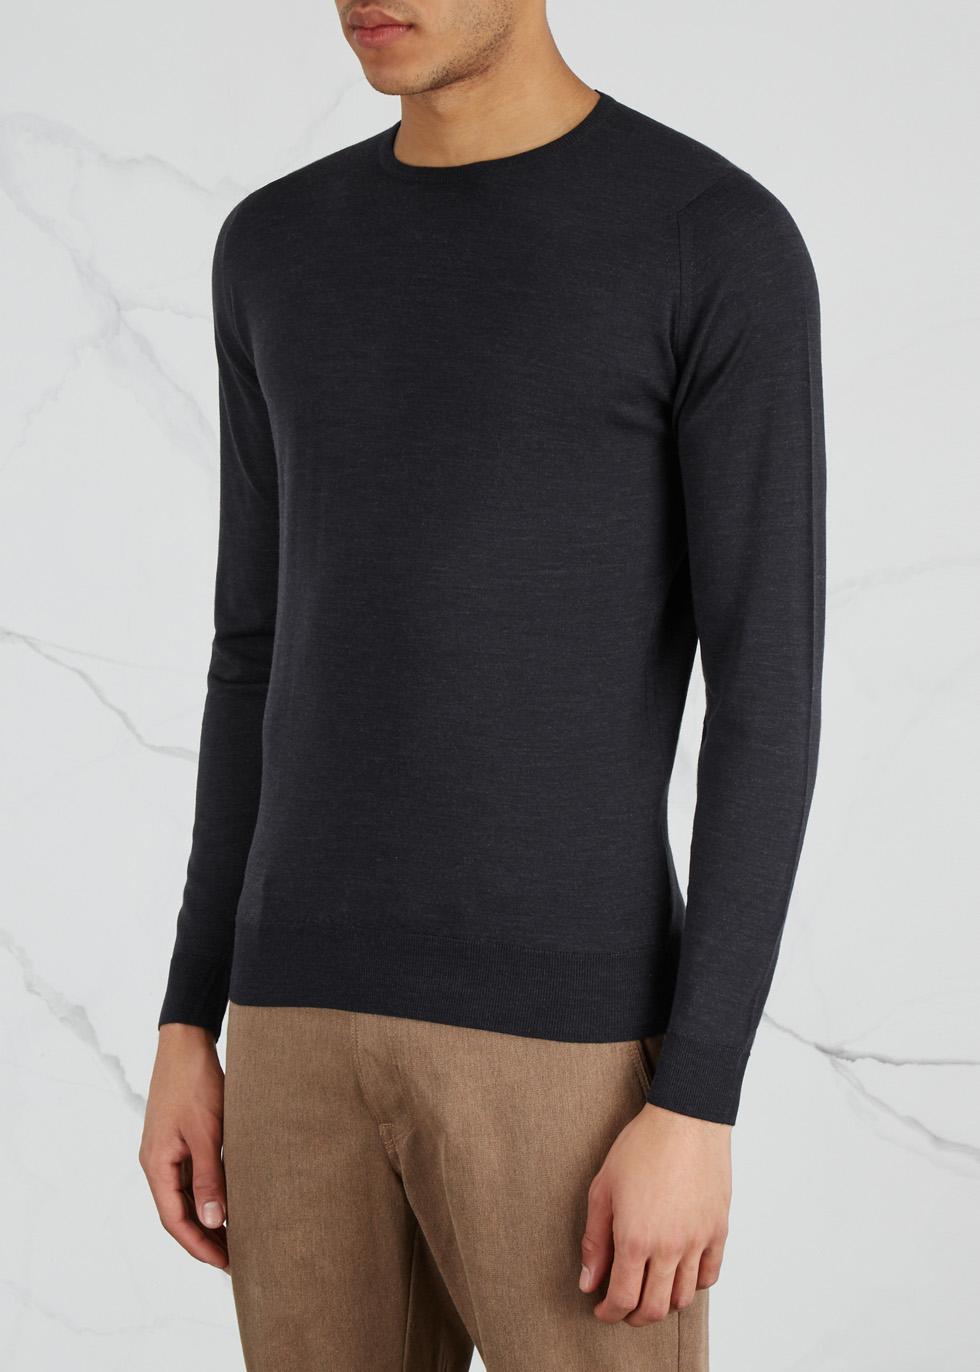 Lundy charcoal fine-knit wool jumper - John Smedley